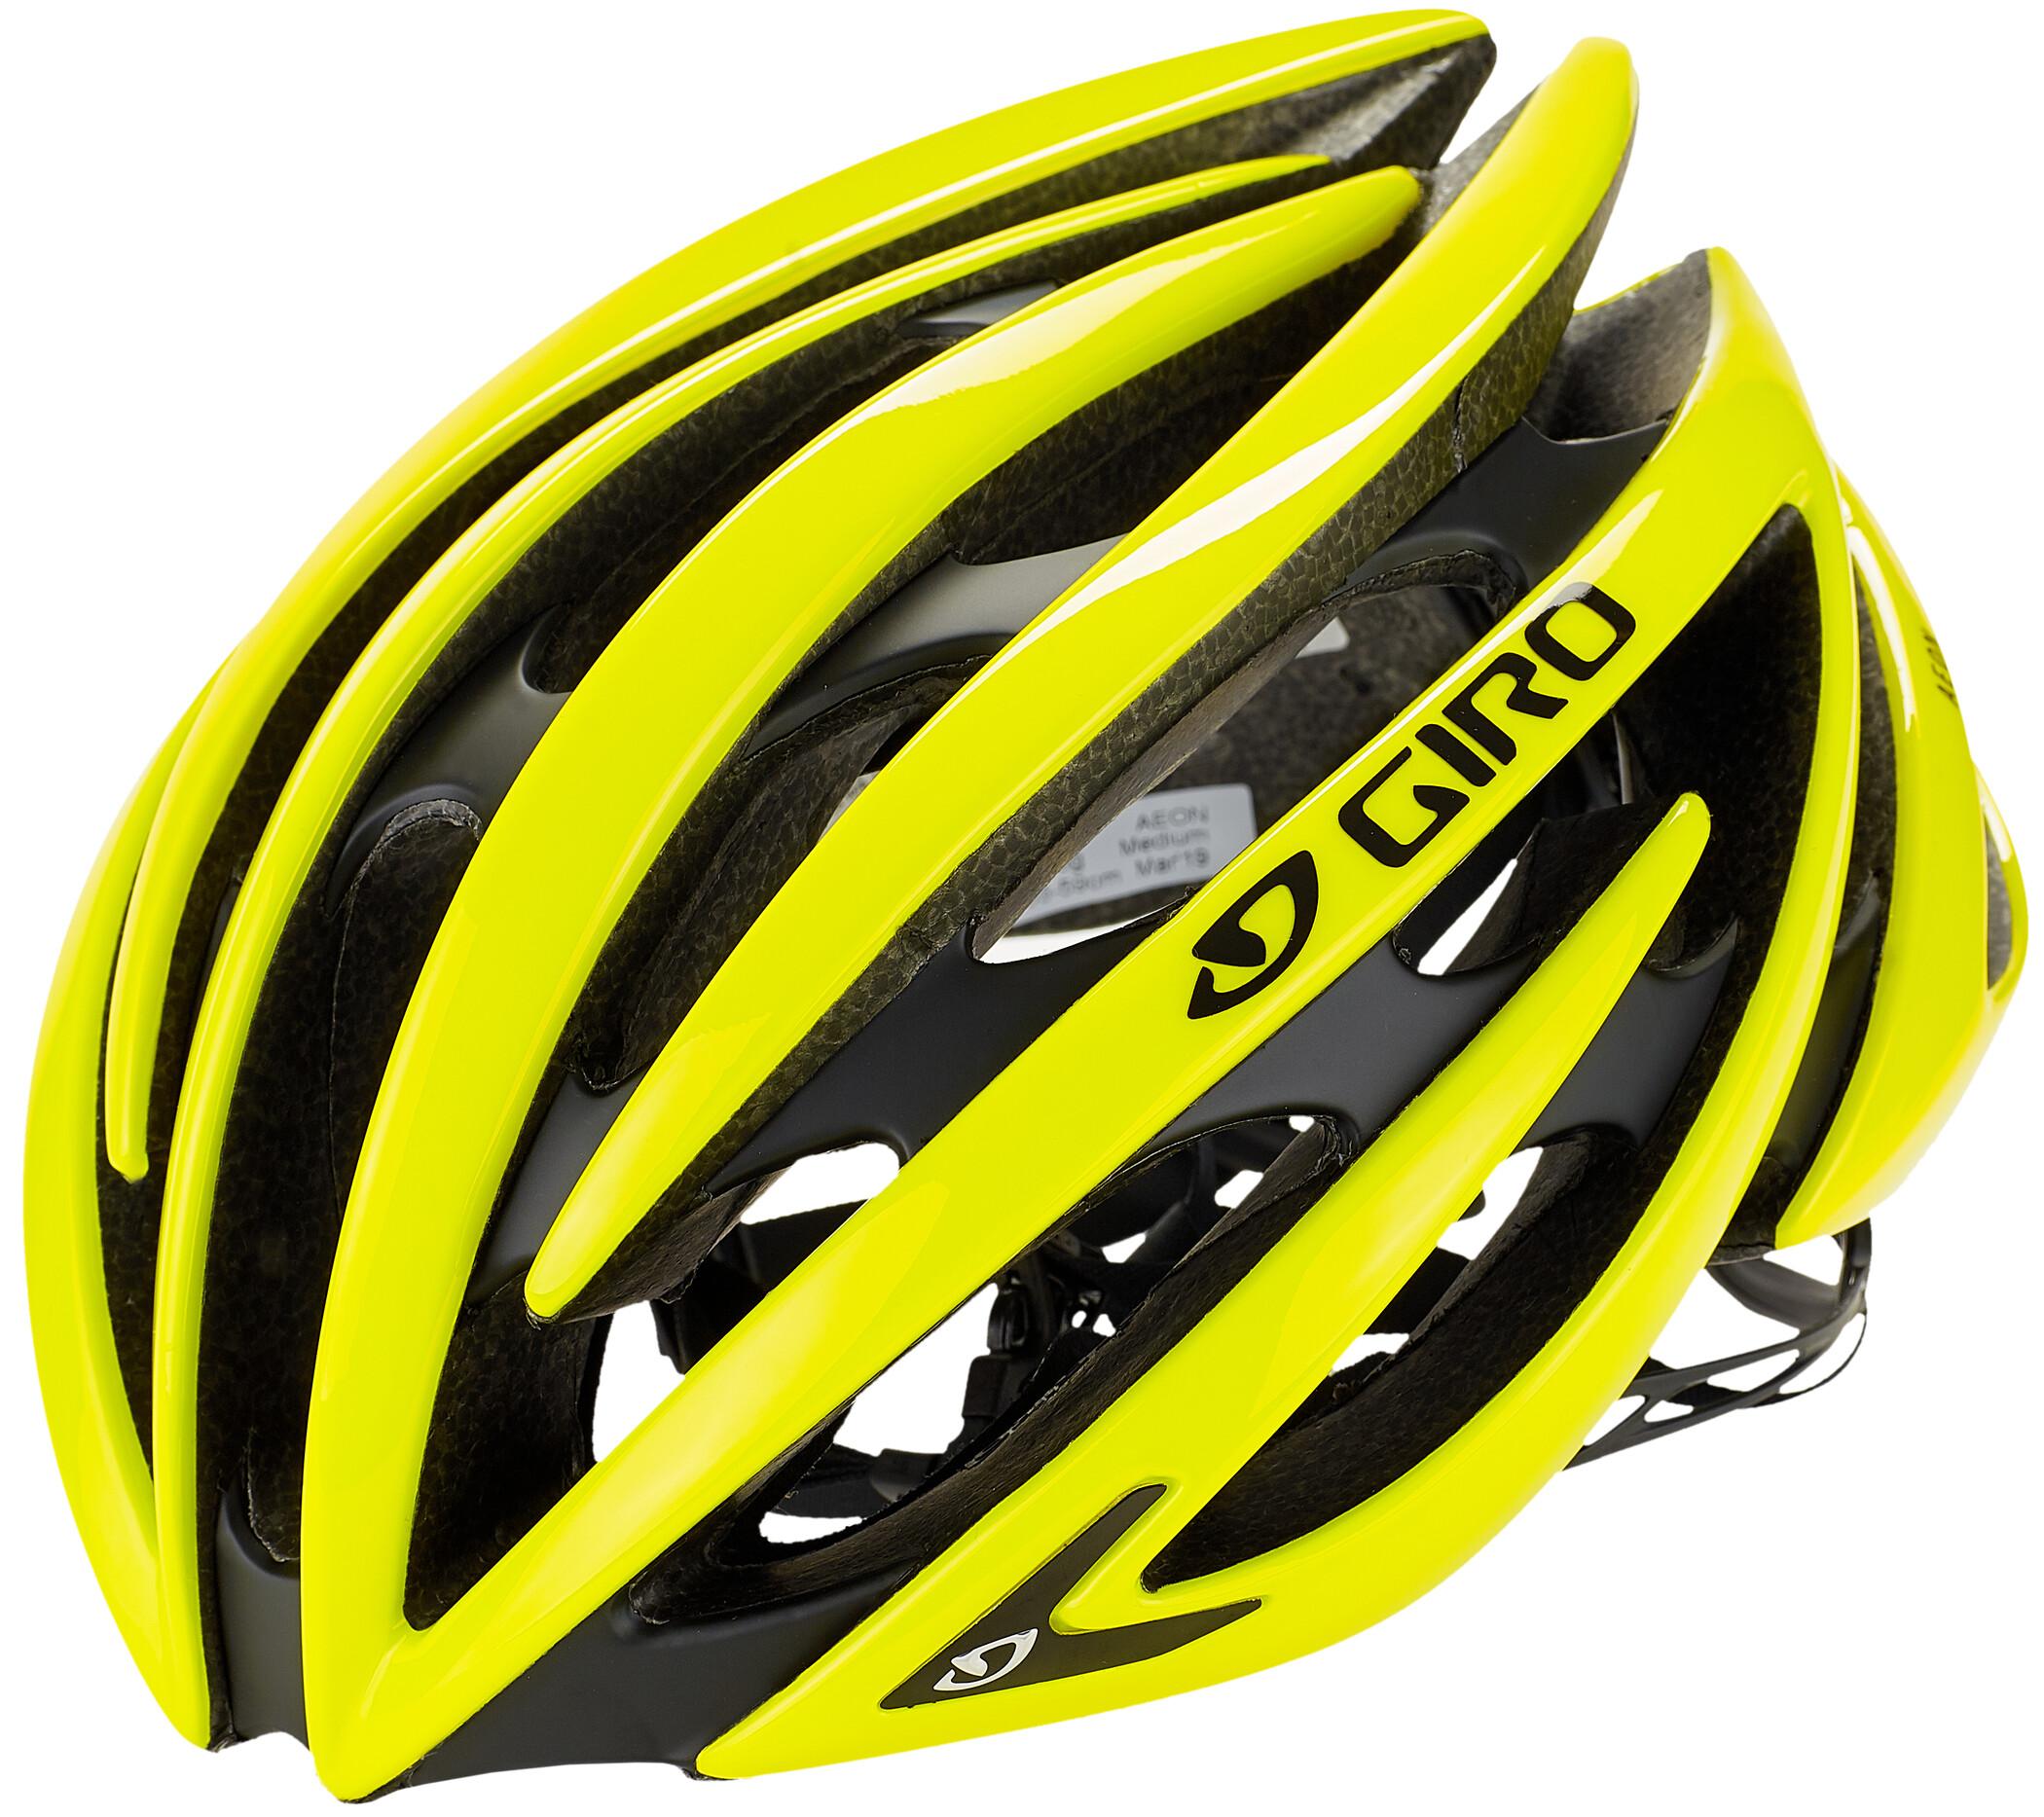 Giro Aeon Cykelhjelm, citron (2019) | Helmets